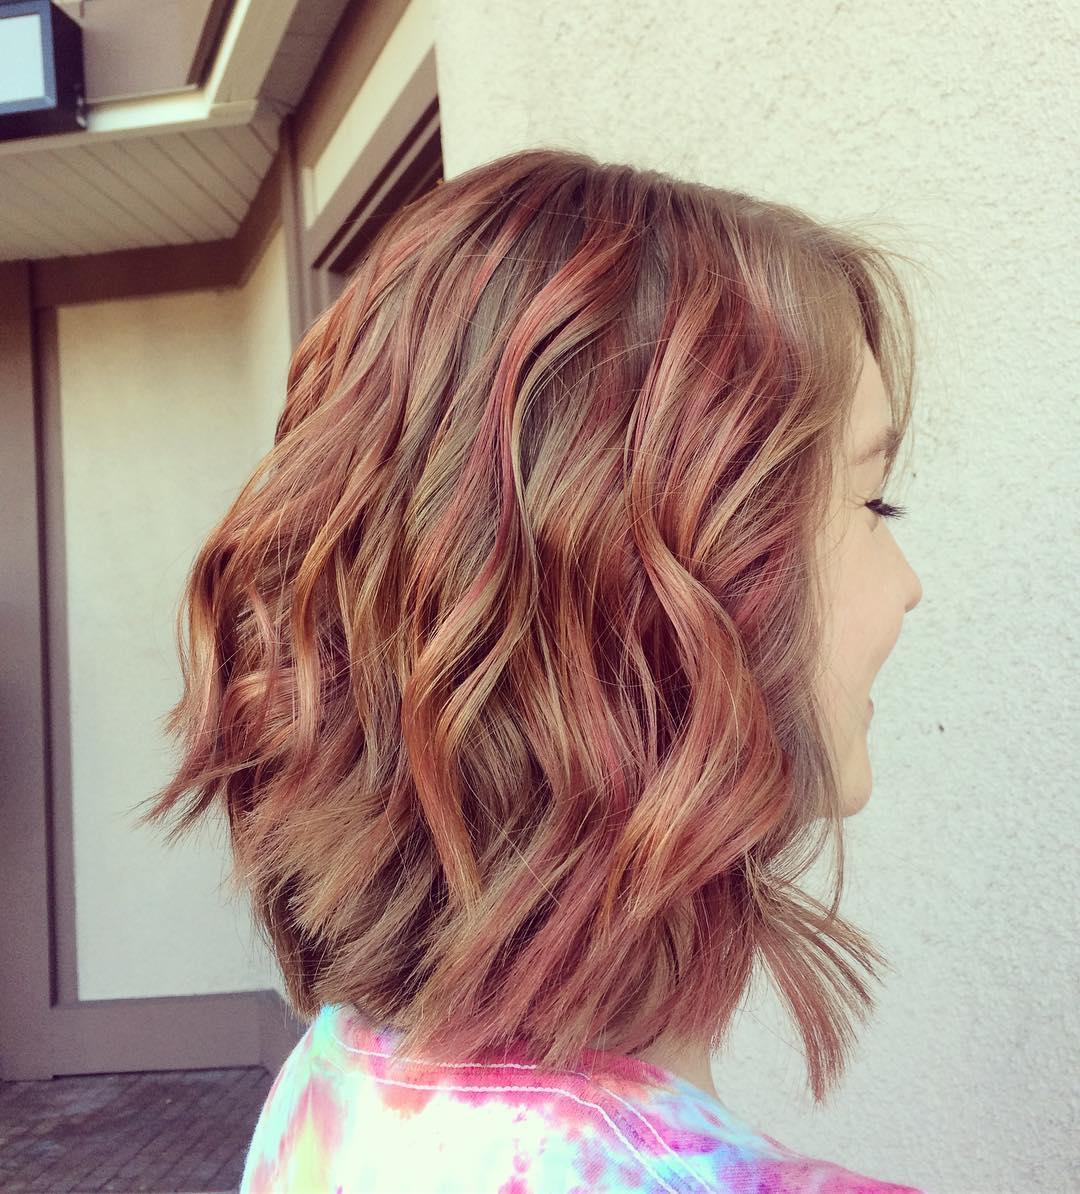 10 lob haircut ideas - edgy cuts & hot new colors - popular haircuts